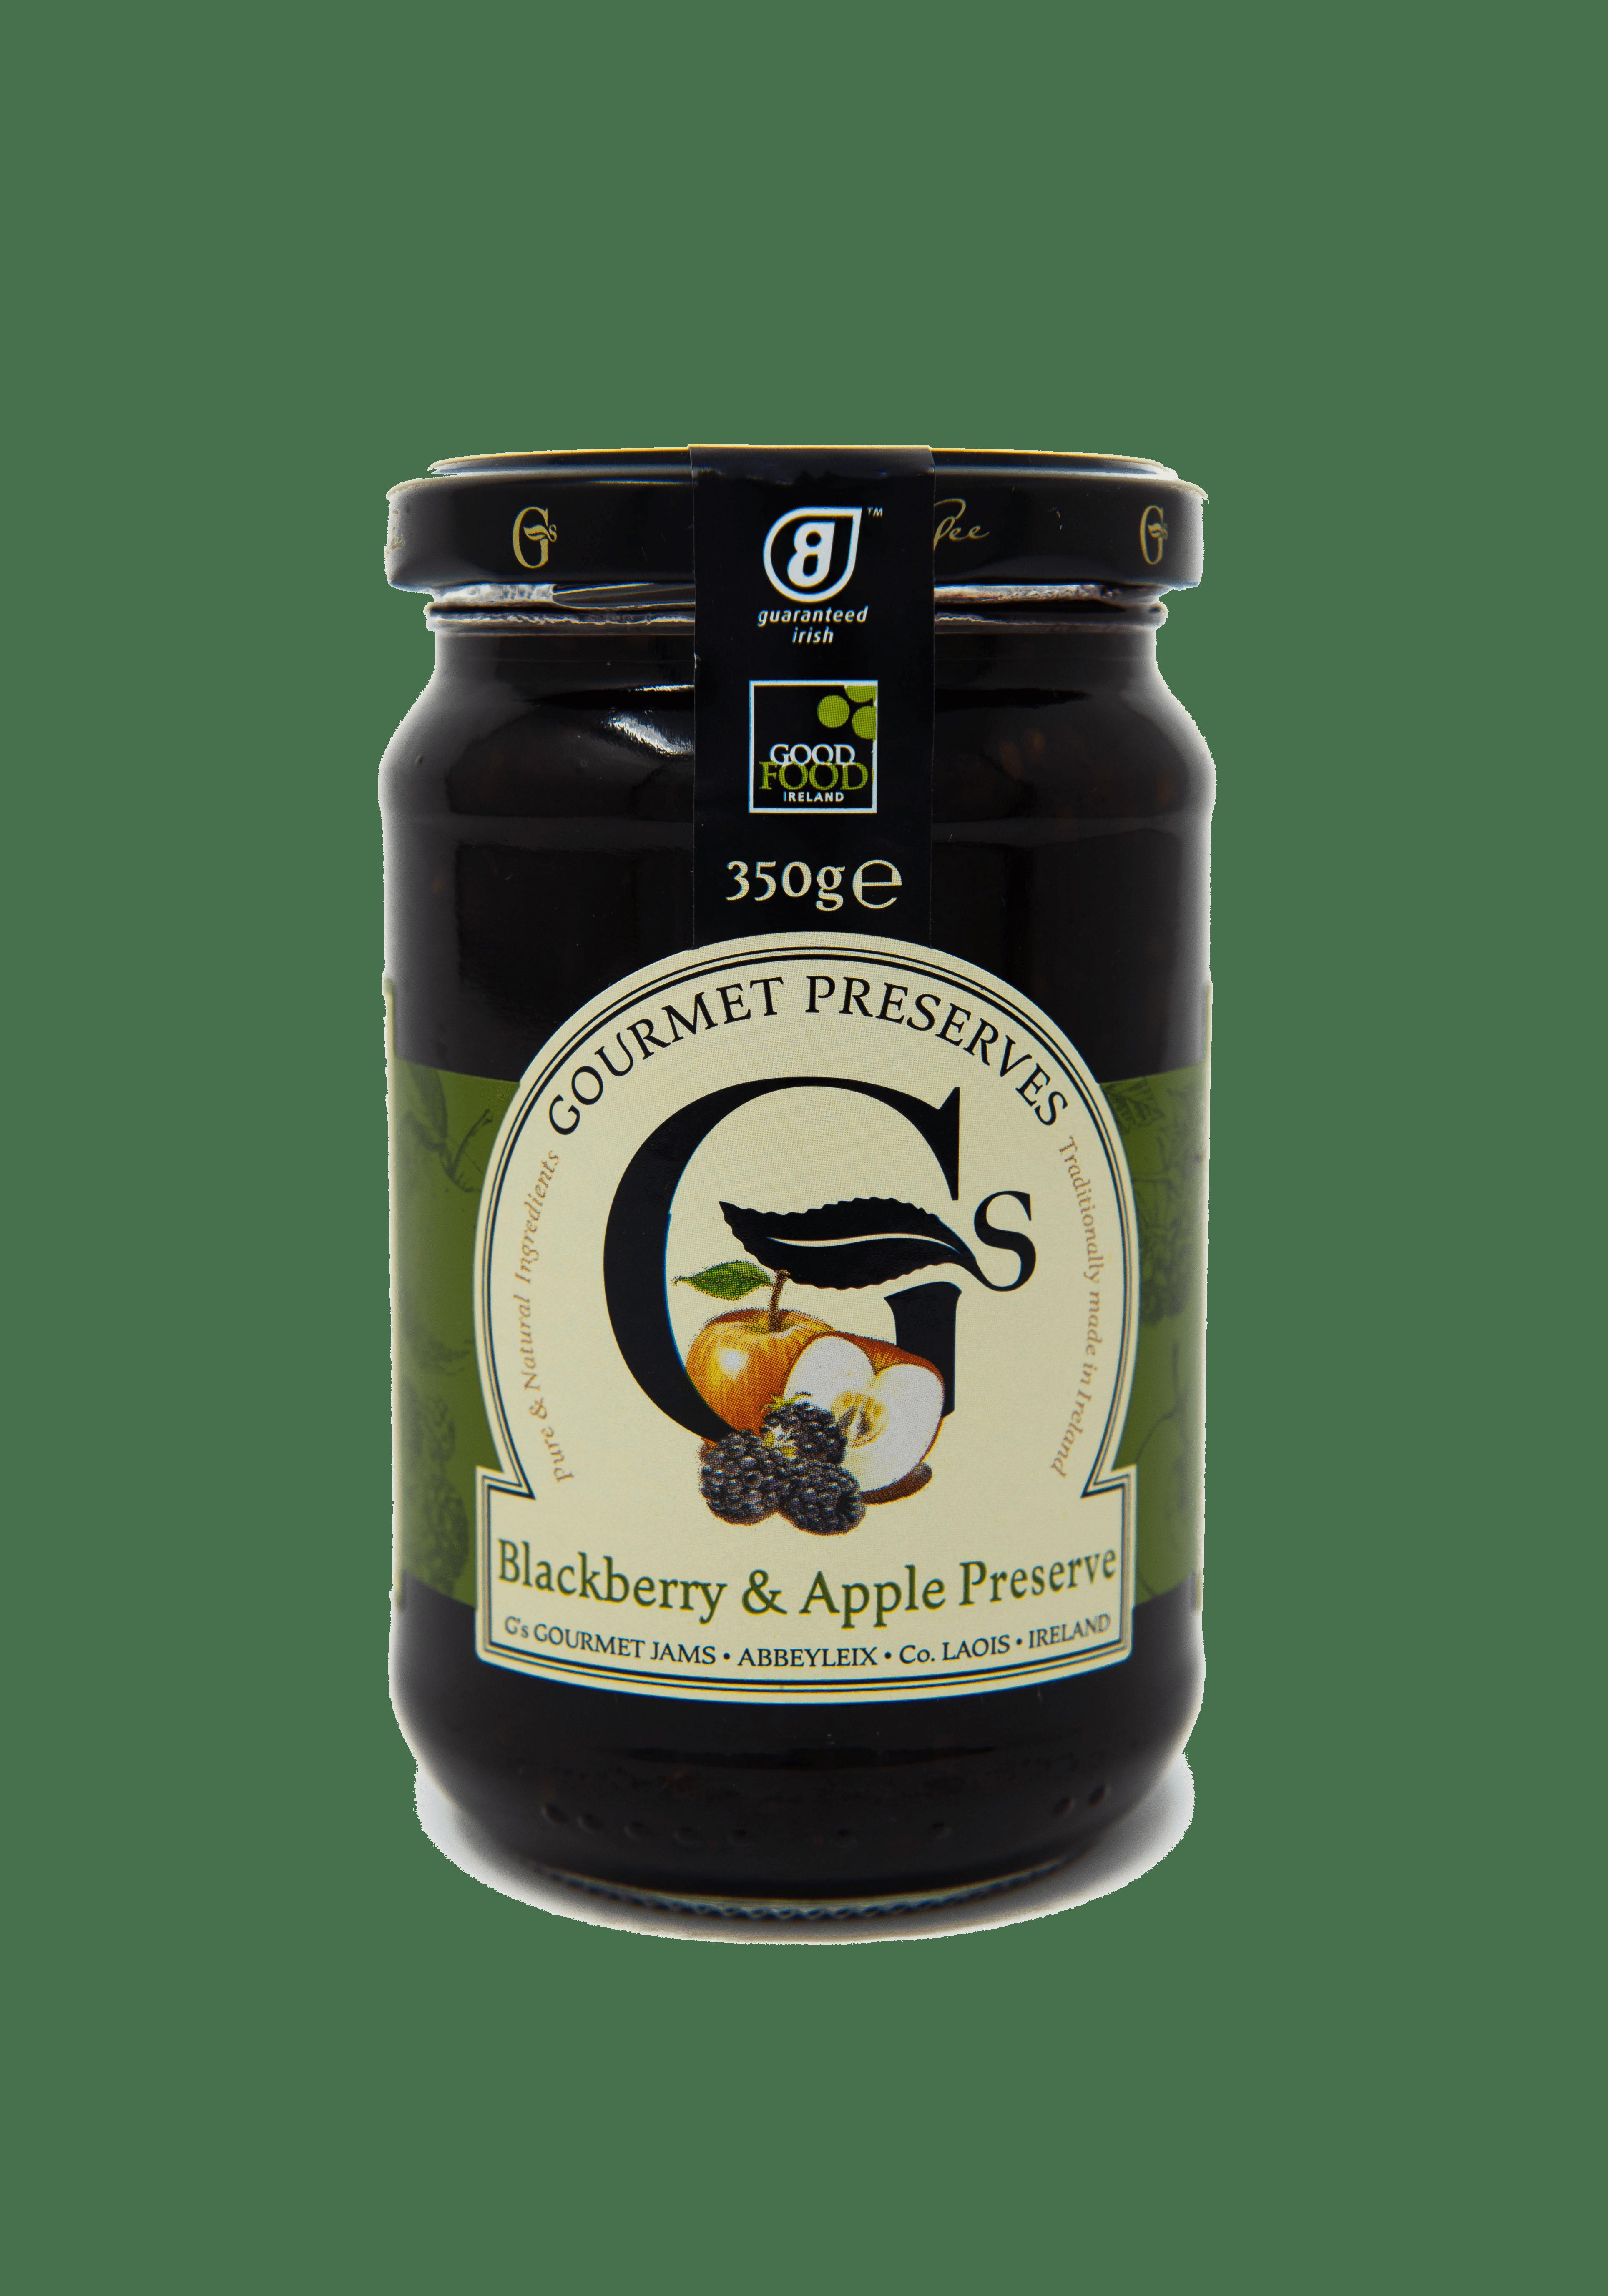 Blackberry & Apple Jam Image